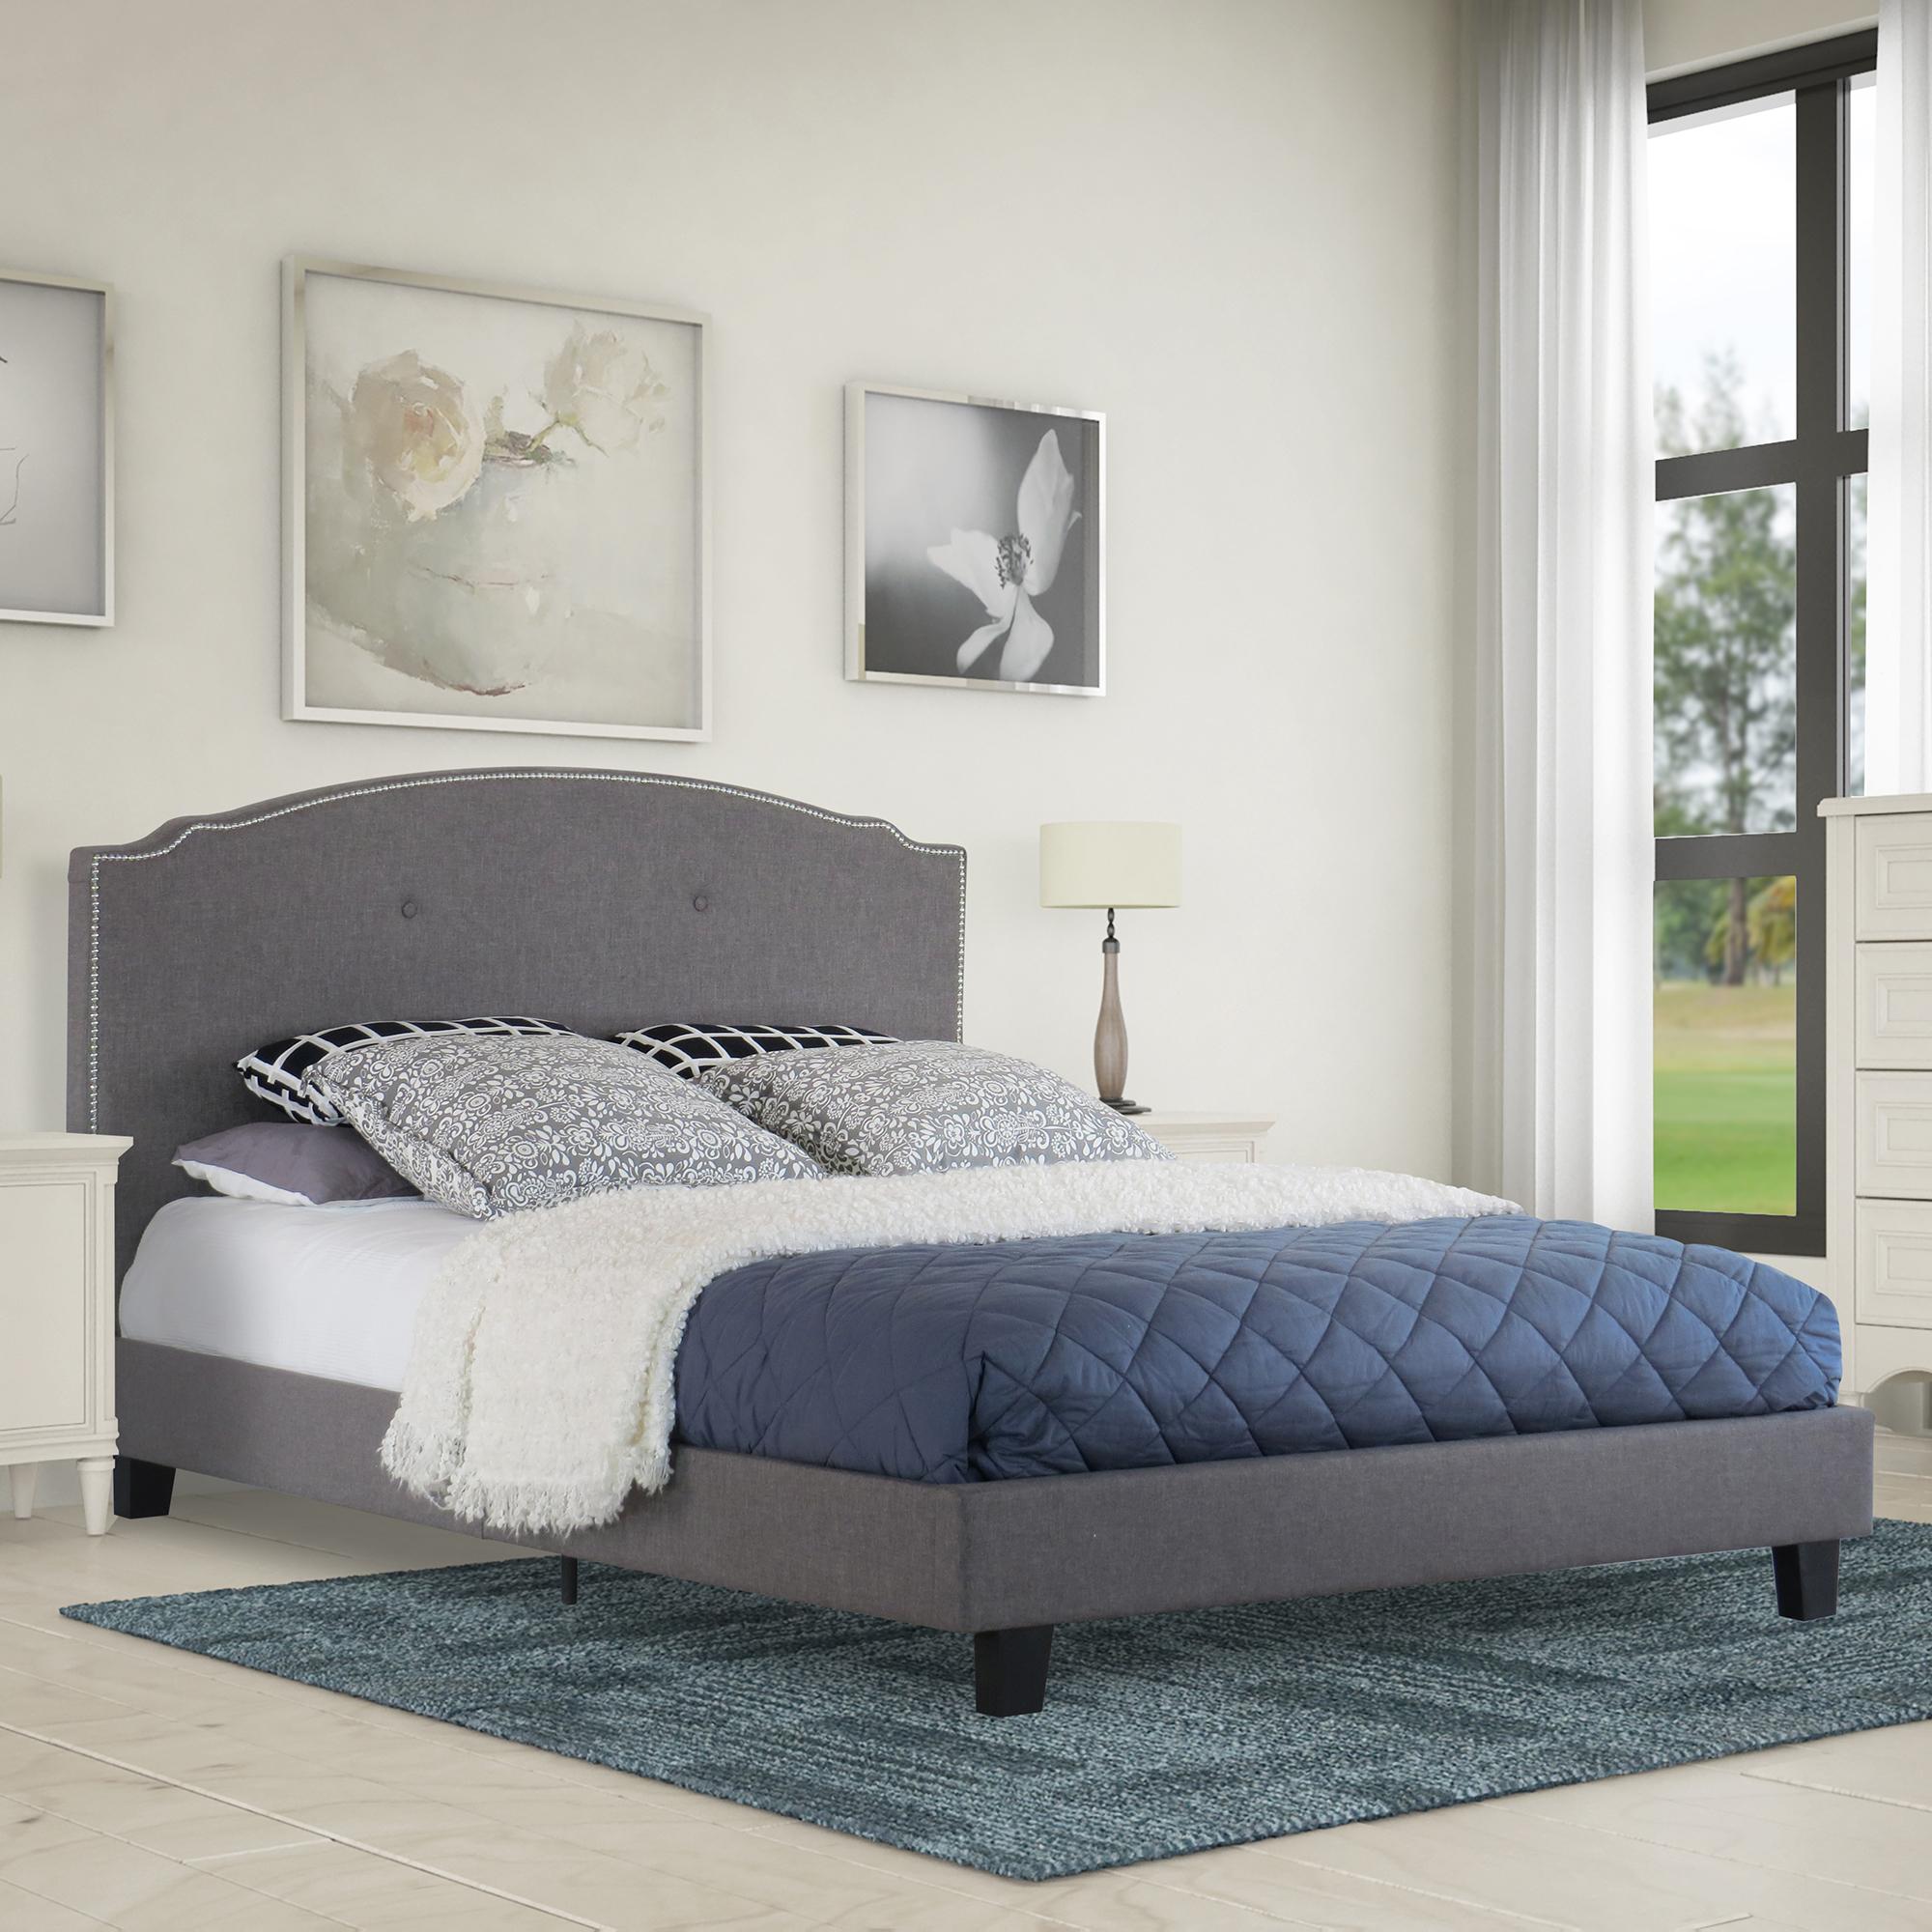 NEW Grey Portland Bed Frame - Rawson & Co,Beds | eBay